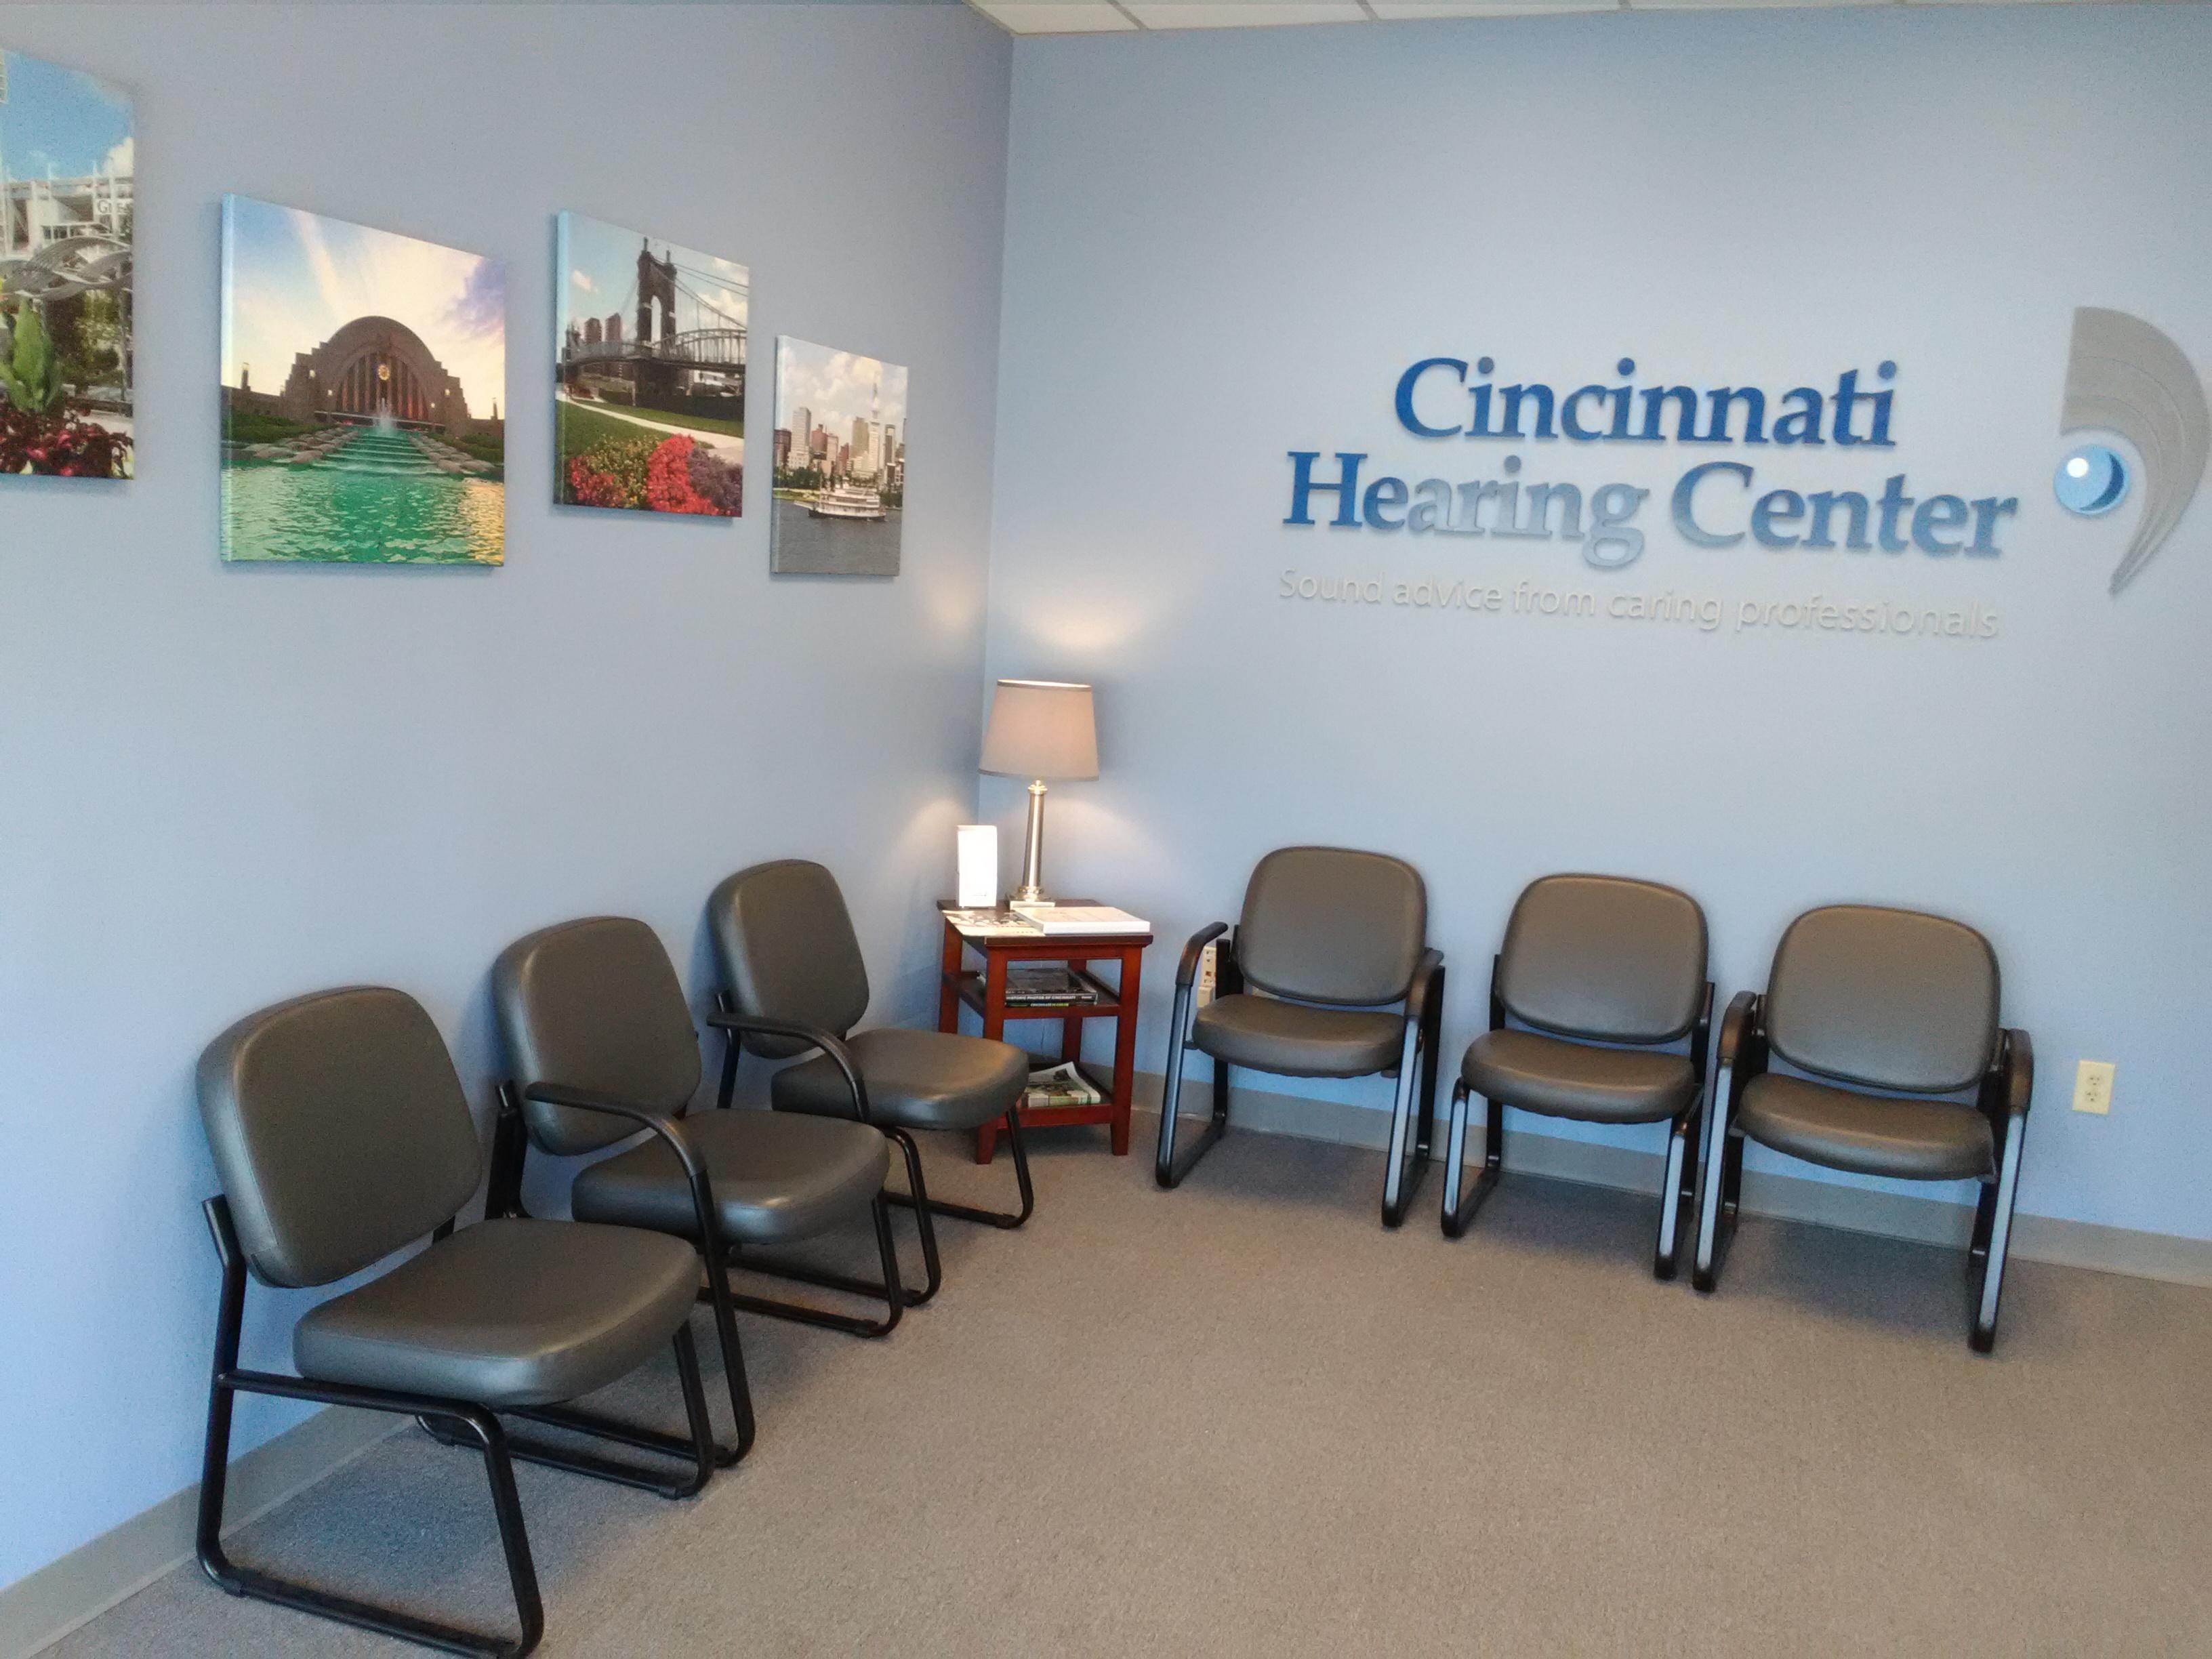 Cincinnati Hearing Center